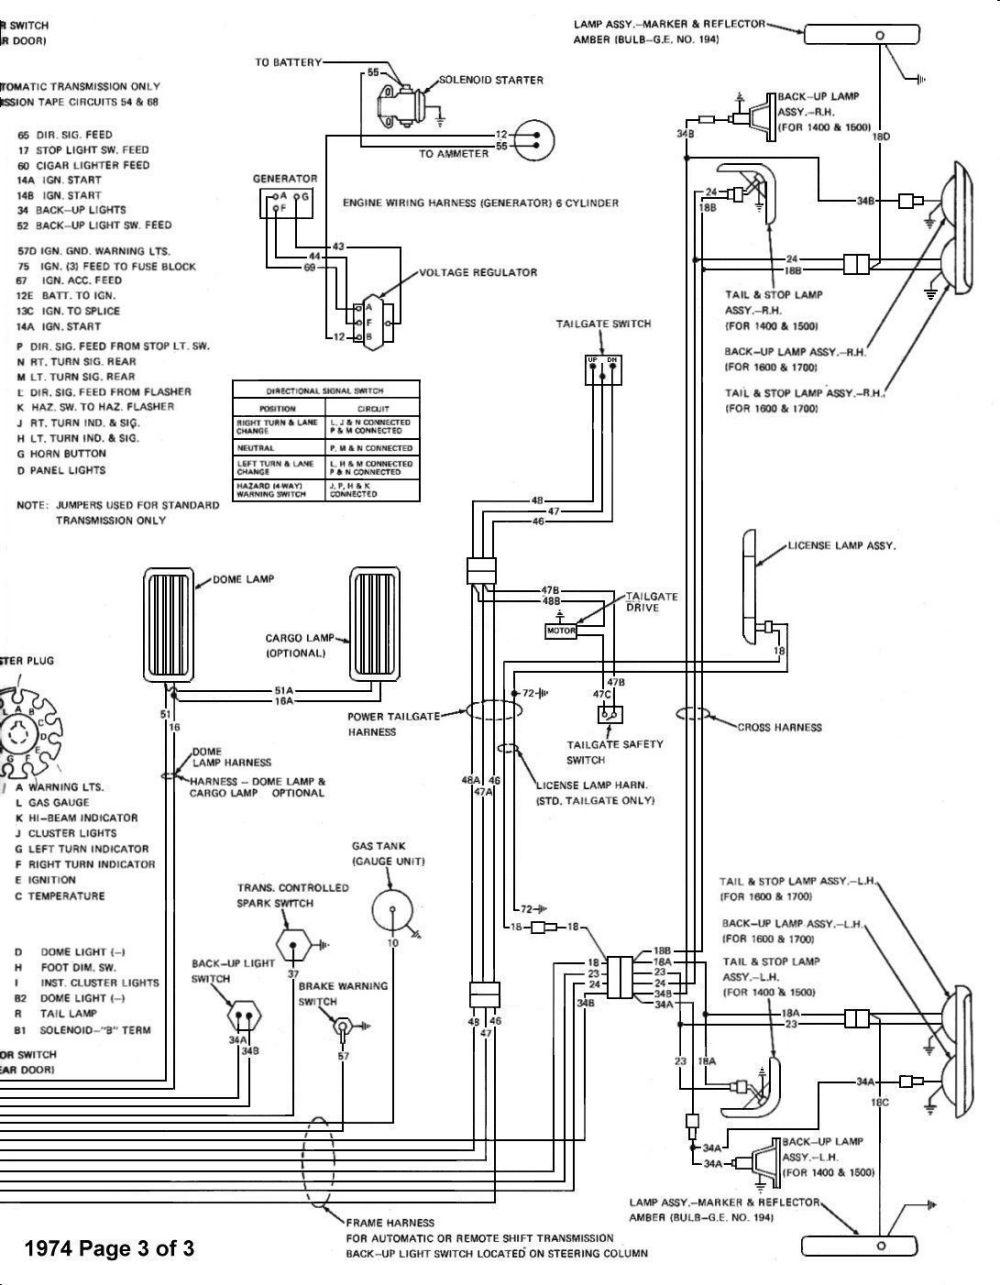 medium resolution of 47 jeep wiring diagram wiring diagrams 96 jeep cherokee wiring diagram blower motor fuse 1948 willys jeep wiring diagram jeep cj5 wiring